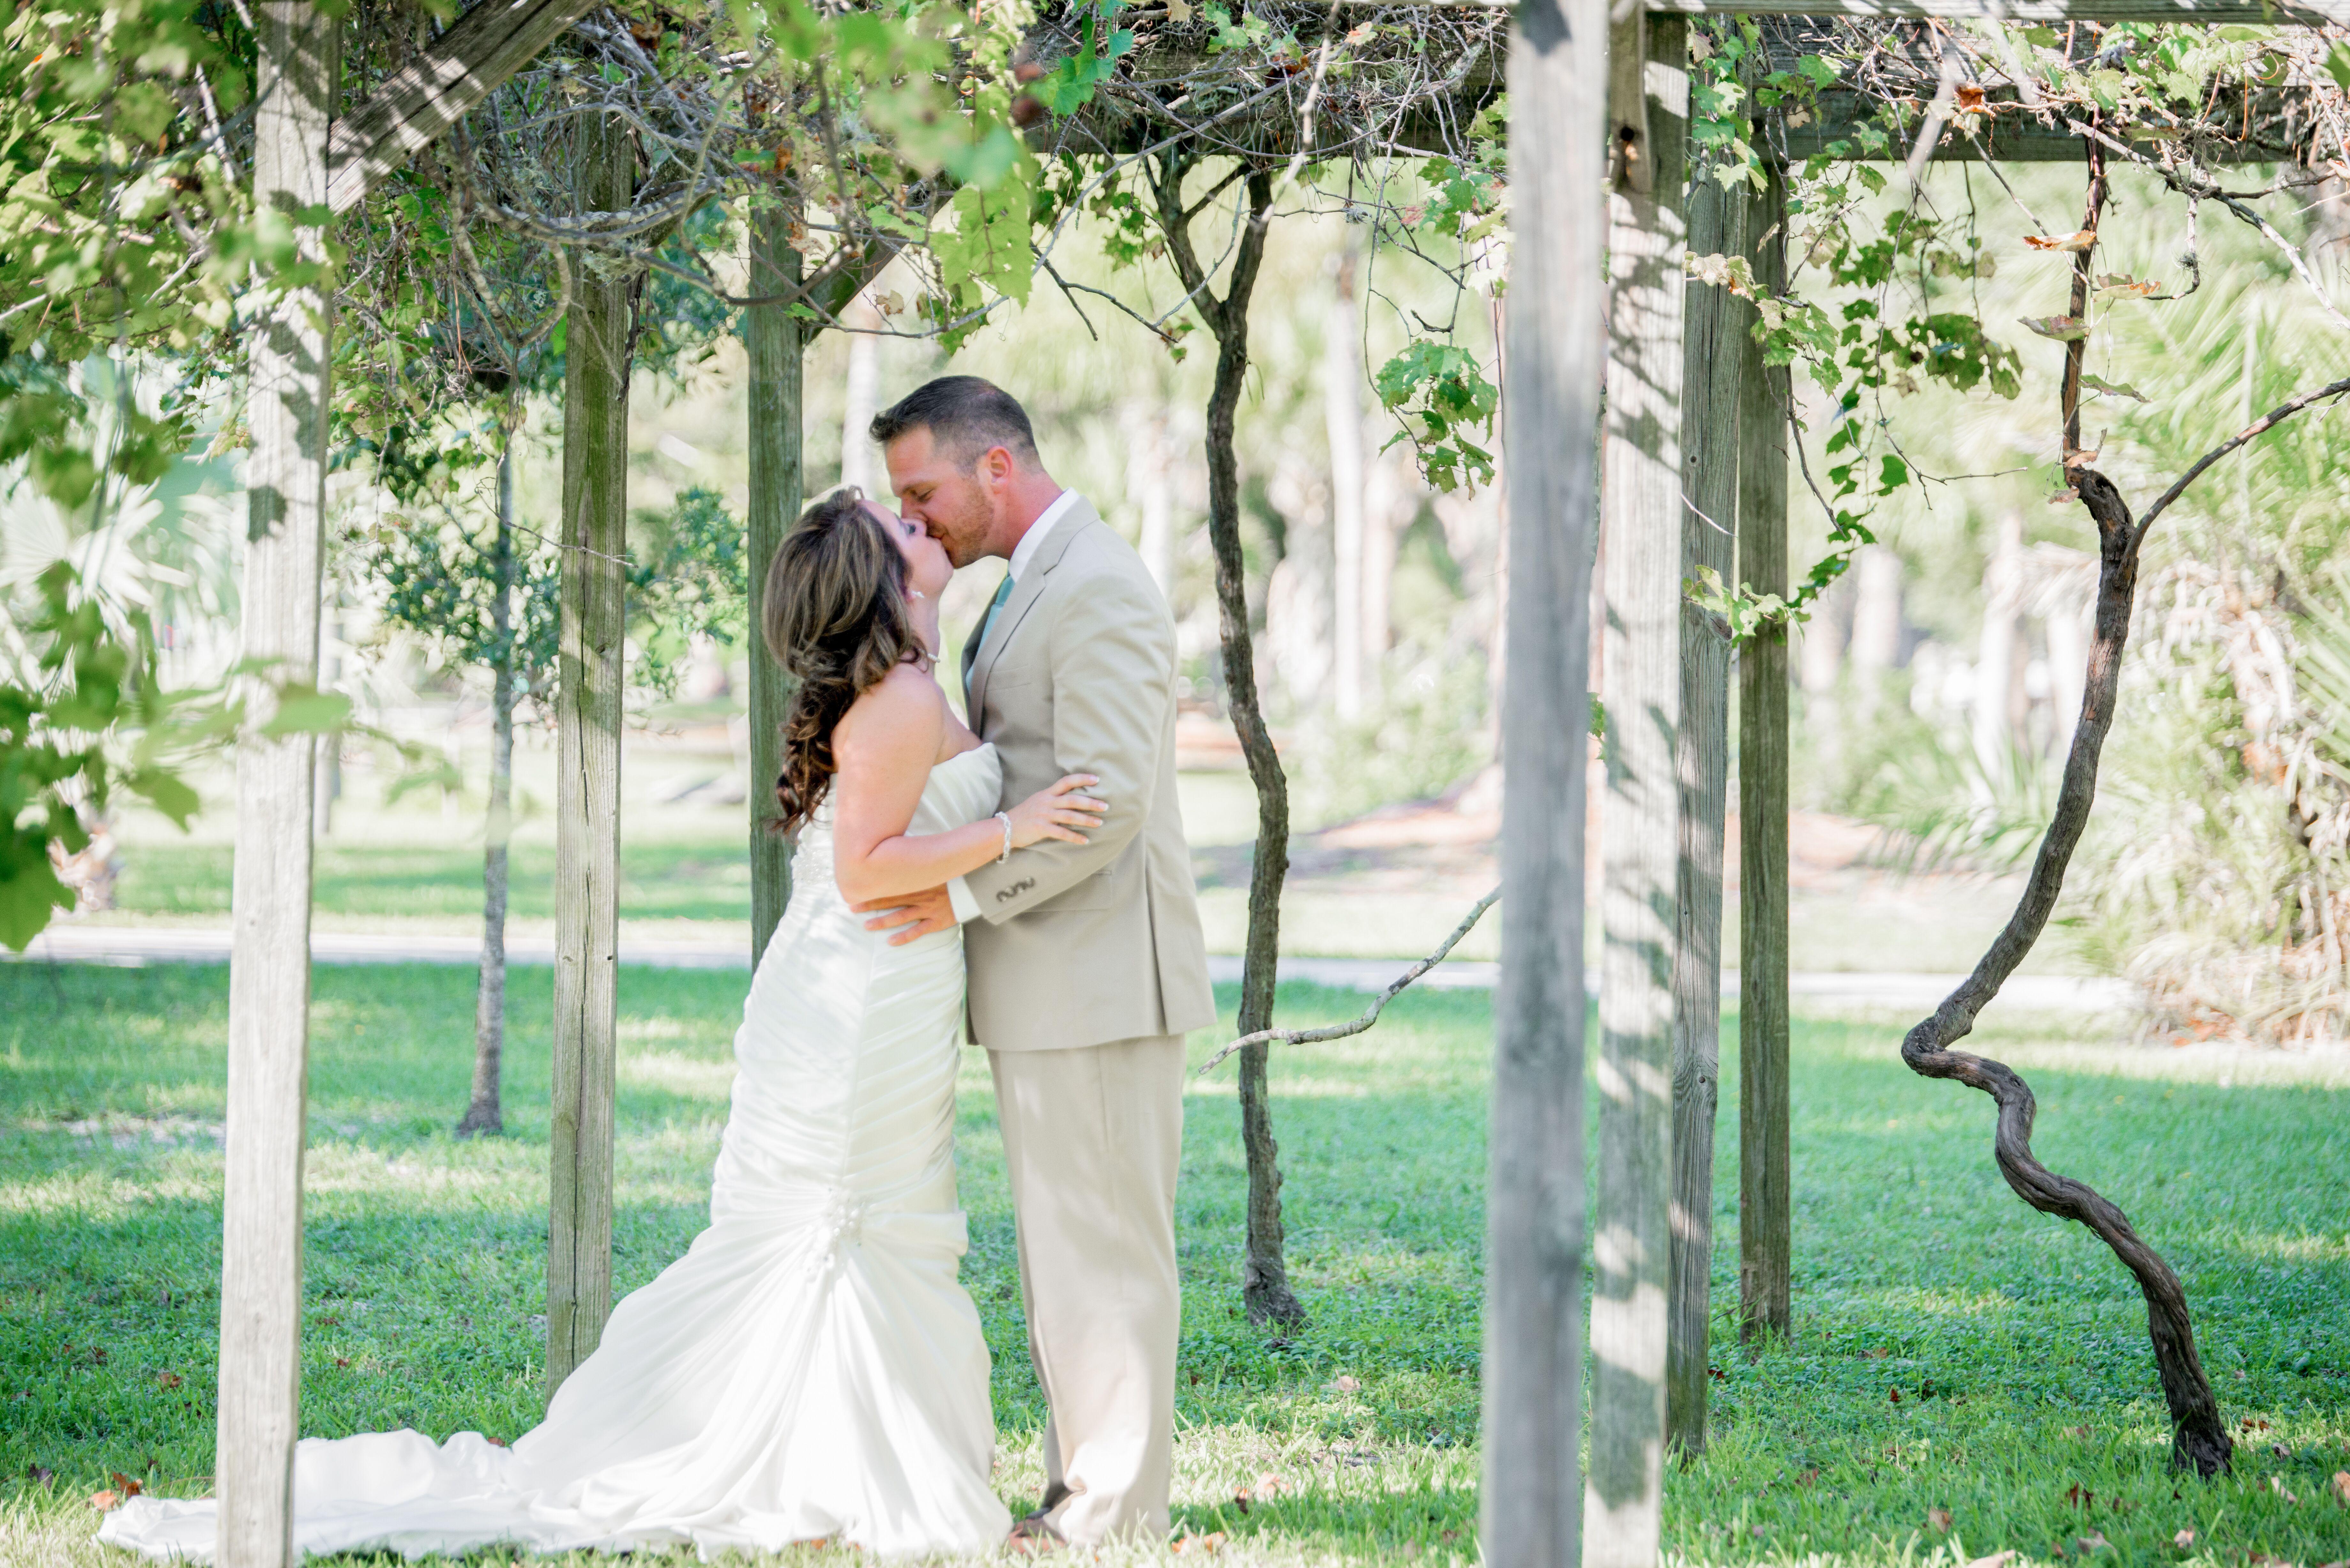 Real Weddings Melbourne: A Beach Wedding At The Hilton Melbourne Beach Oceanfront